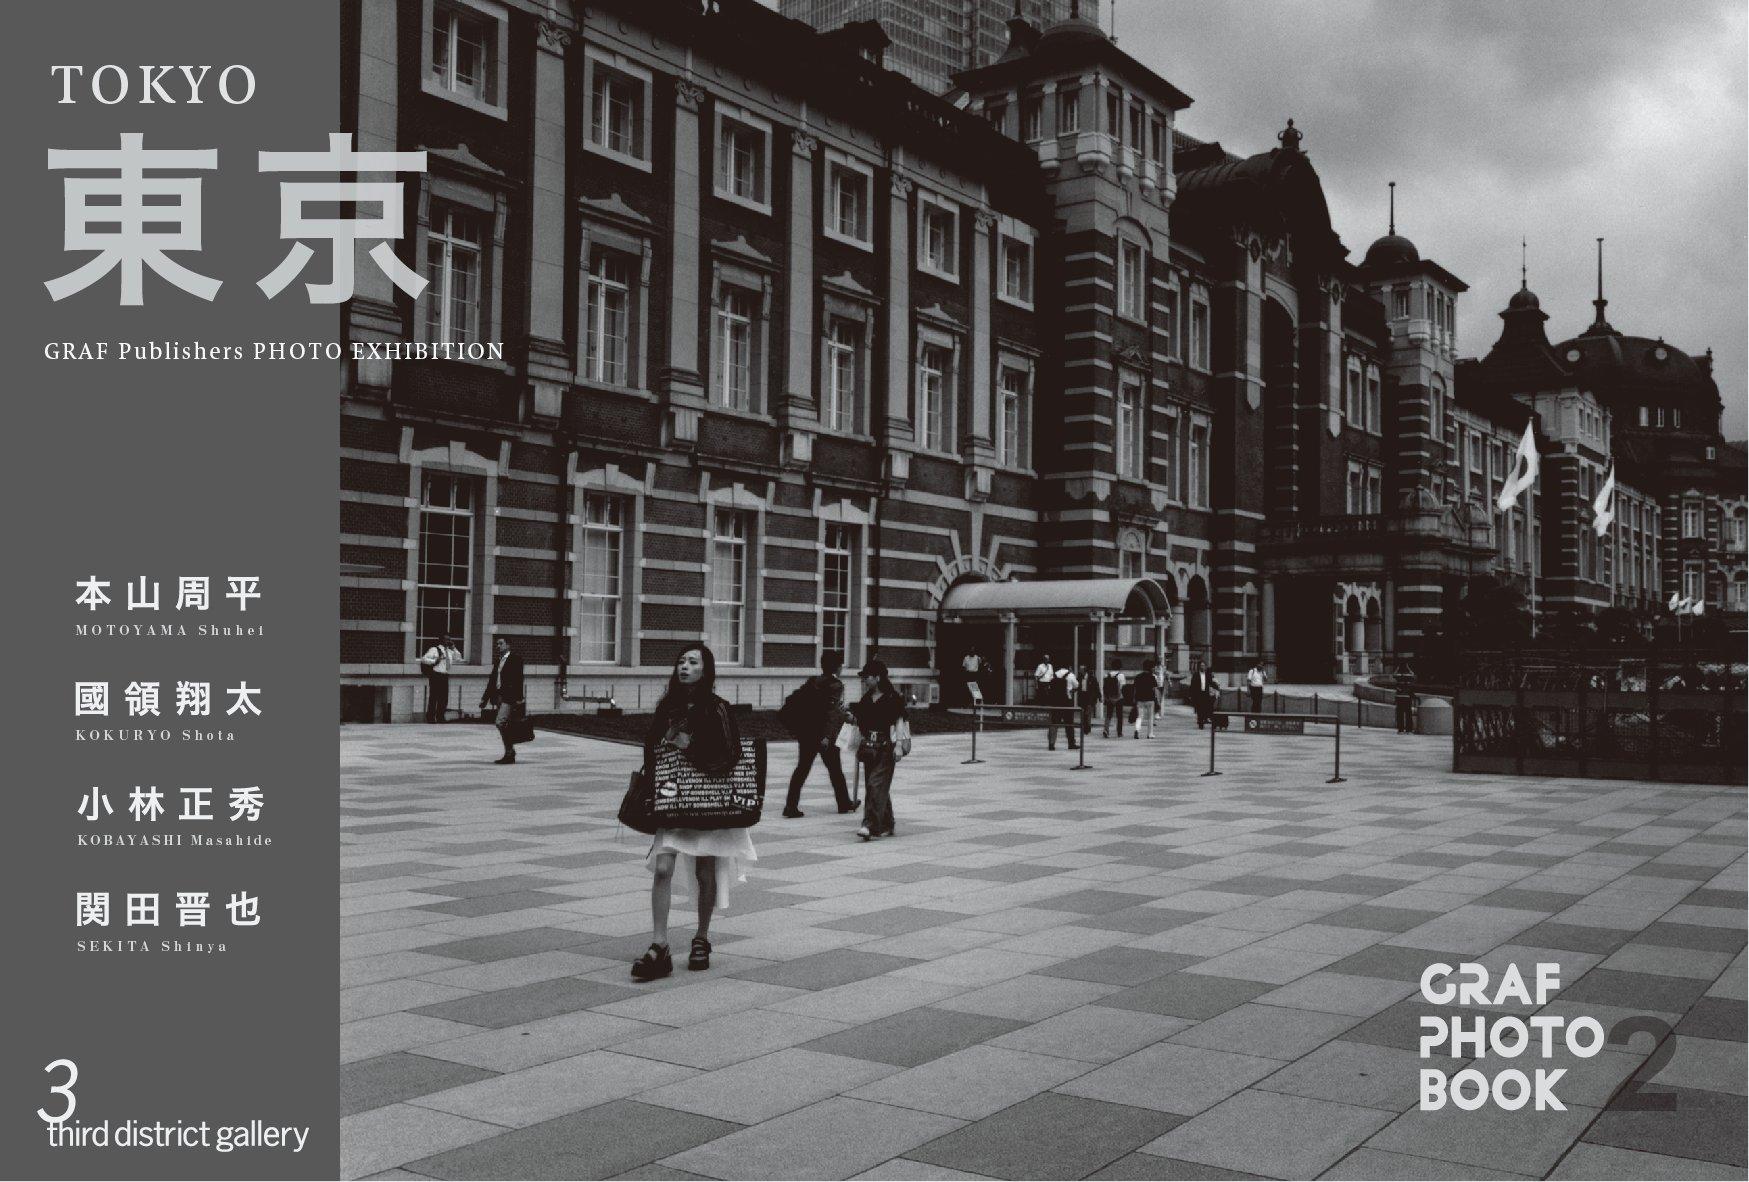 GRAF Publishers(グラフパブリッシャーズ)、写真展『GRAF PHOTOBOOK 2 -東京-』GRAFの写真活動のお知らせ